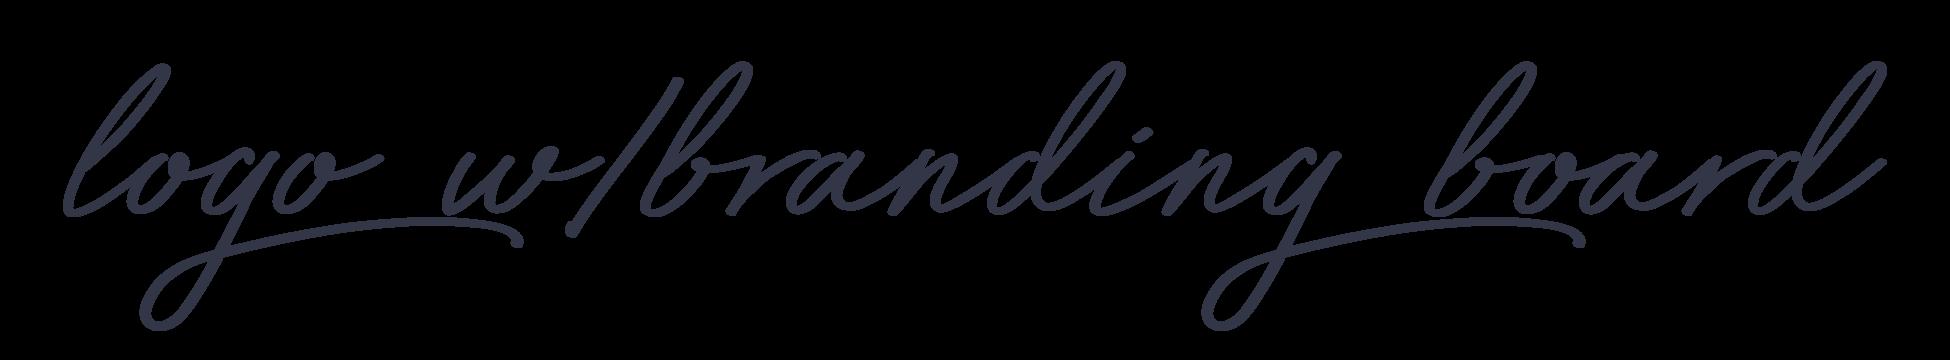 logo branding board.png